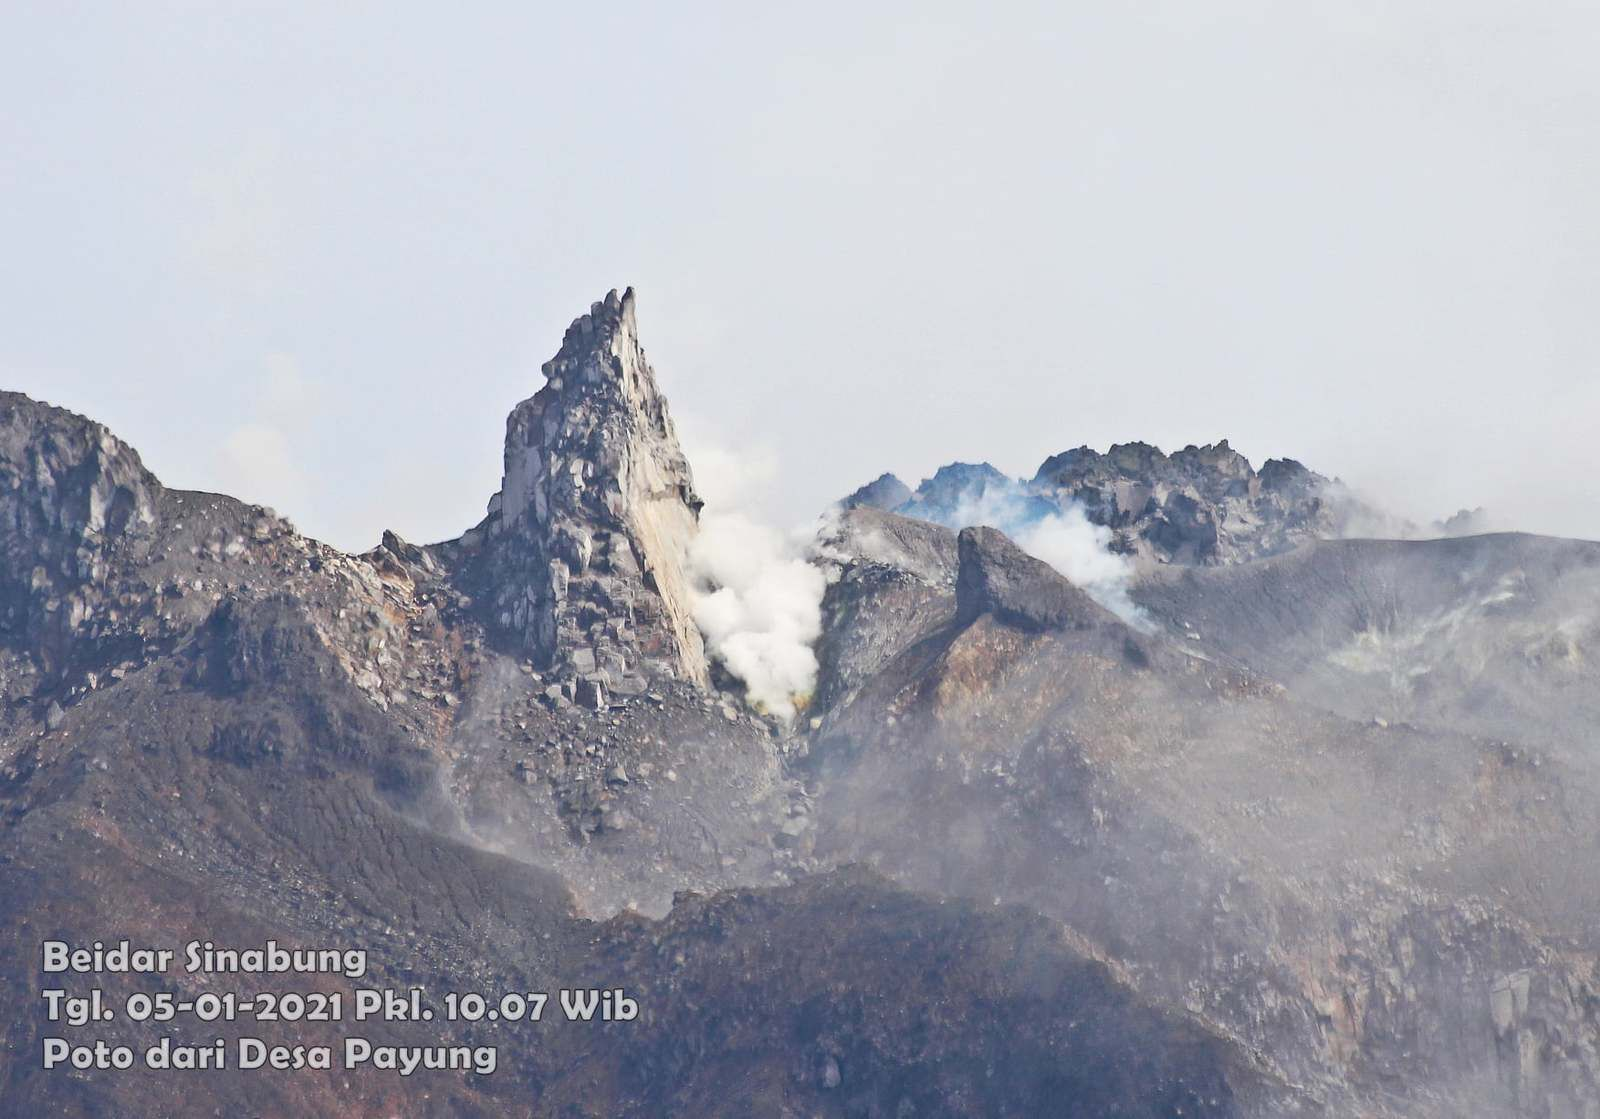 Sinabung - the dome from Payungle 05.01.2021 / 10:07 AM WIB - photo F. Surbakti / Beidar Sinabung